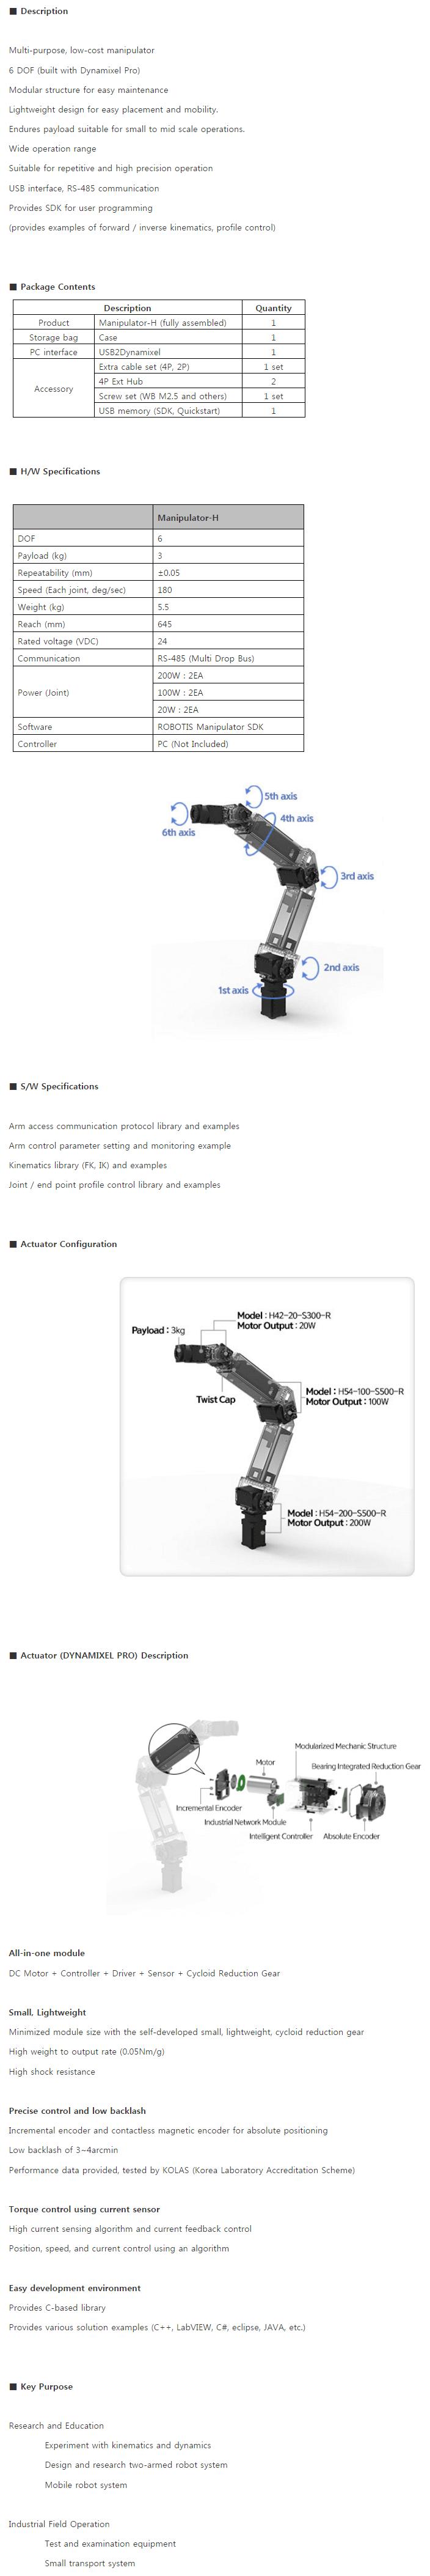 Descripción manipulador H de ROBOTIS con 6 grados de libertad